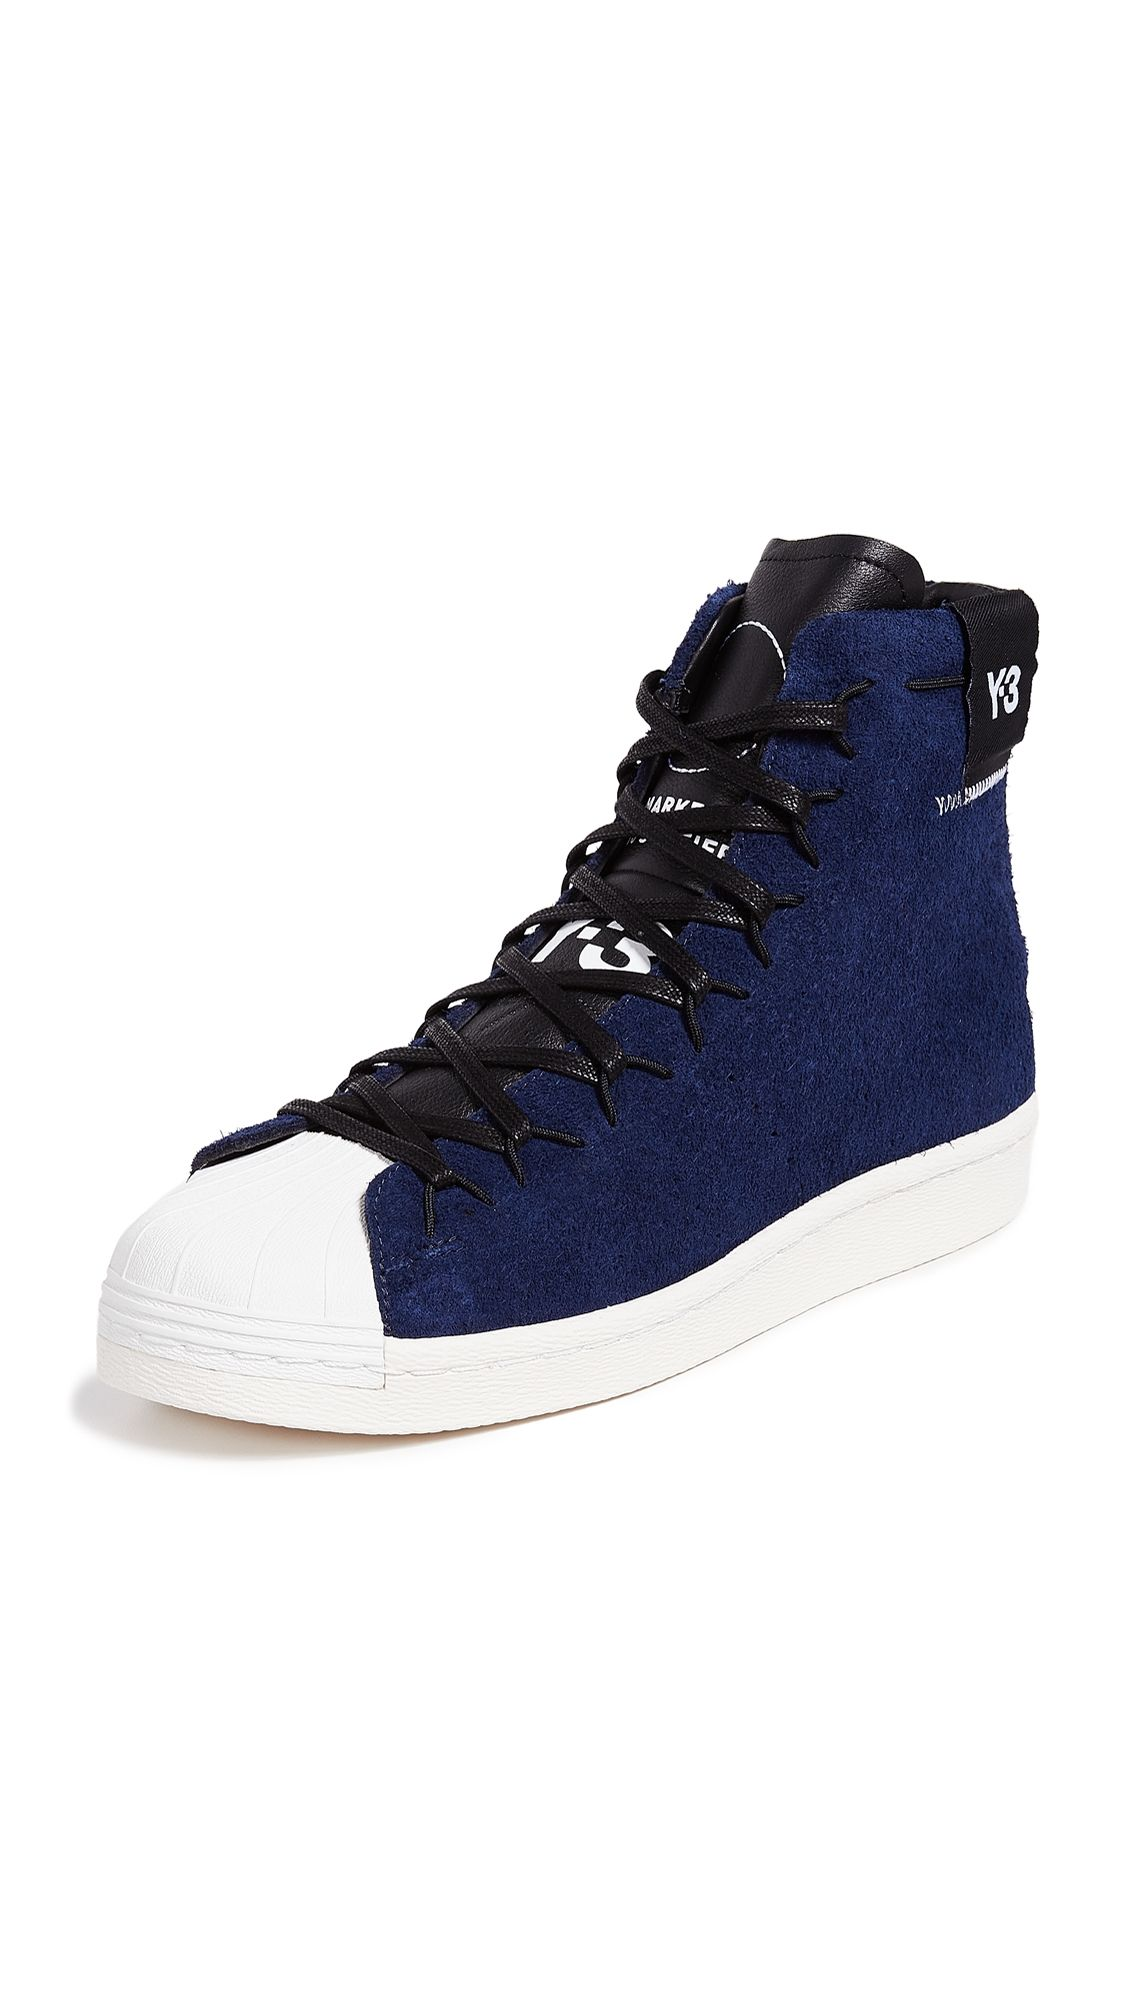 da116d652881 Y-3 SUPER HIGH SNEAKERS.  y-3  shoes